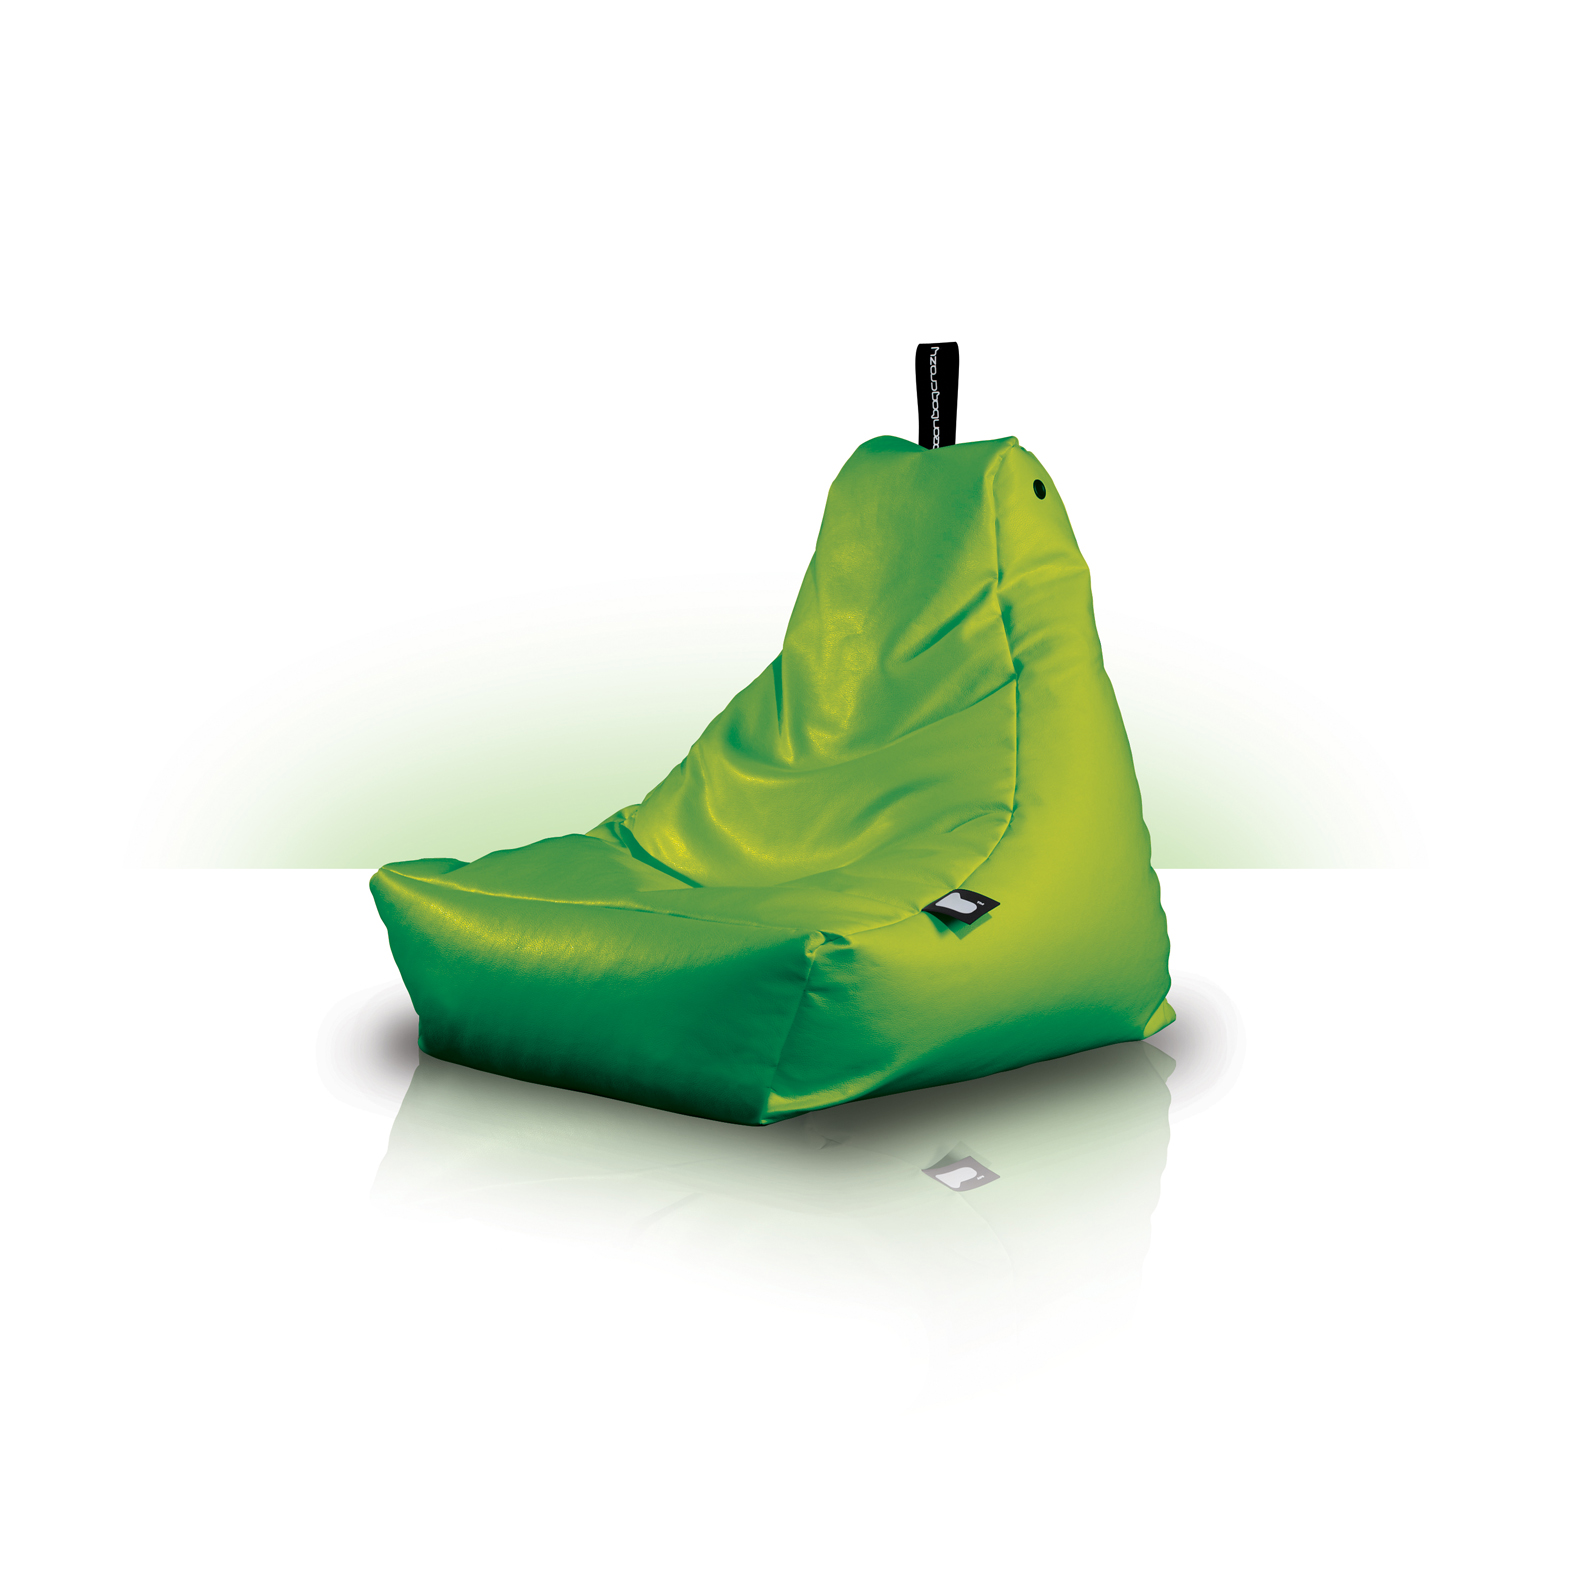 Minib Indoor Bean Bag Lime Green